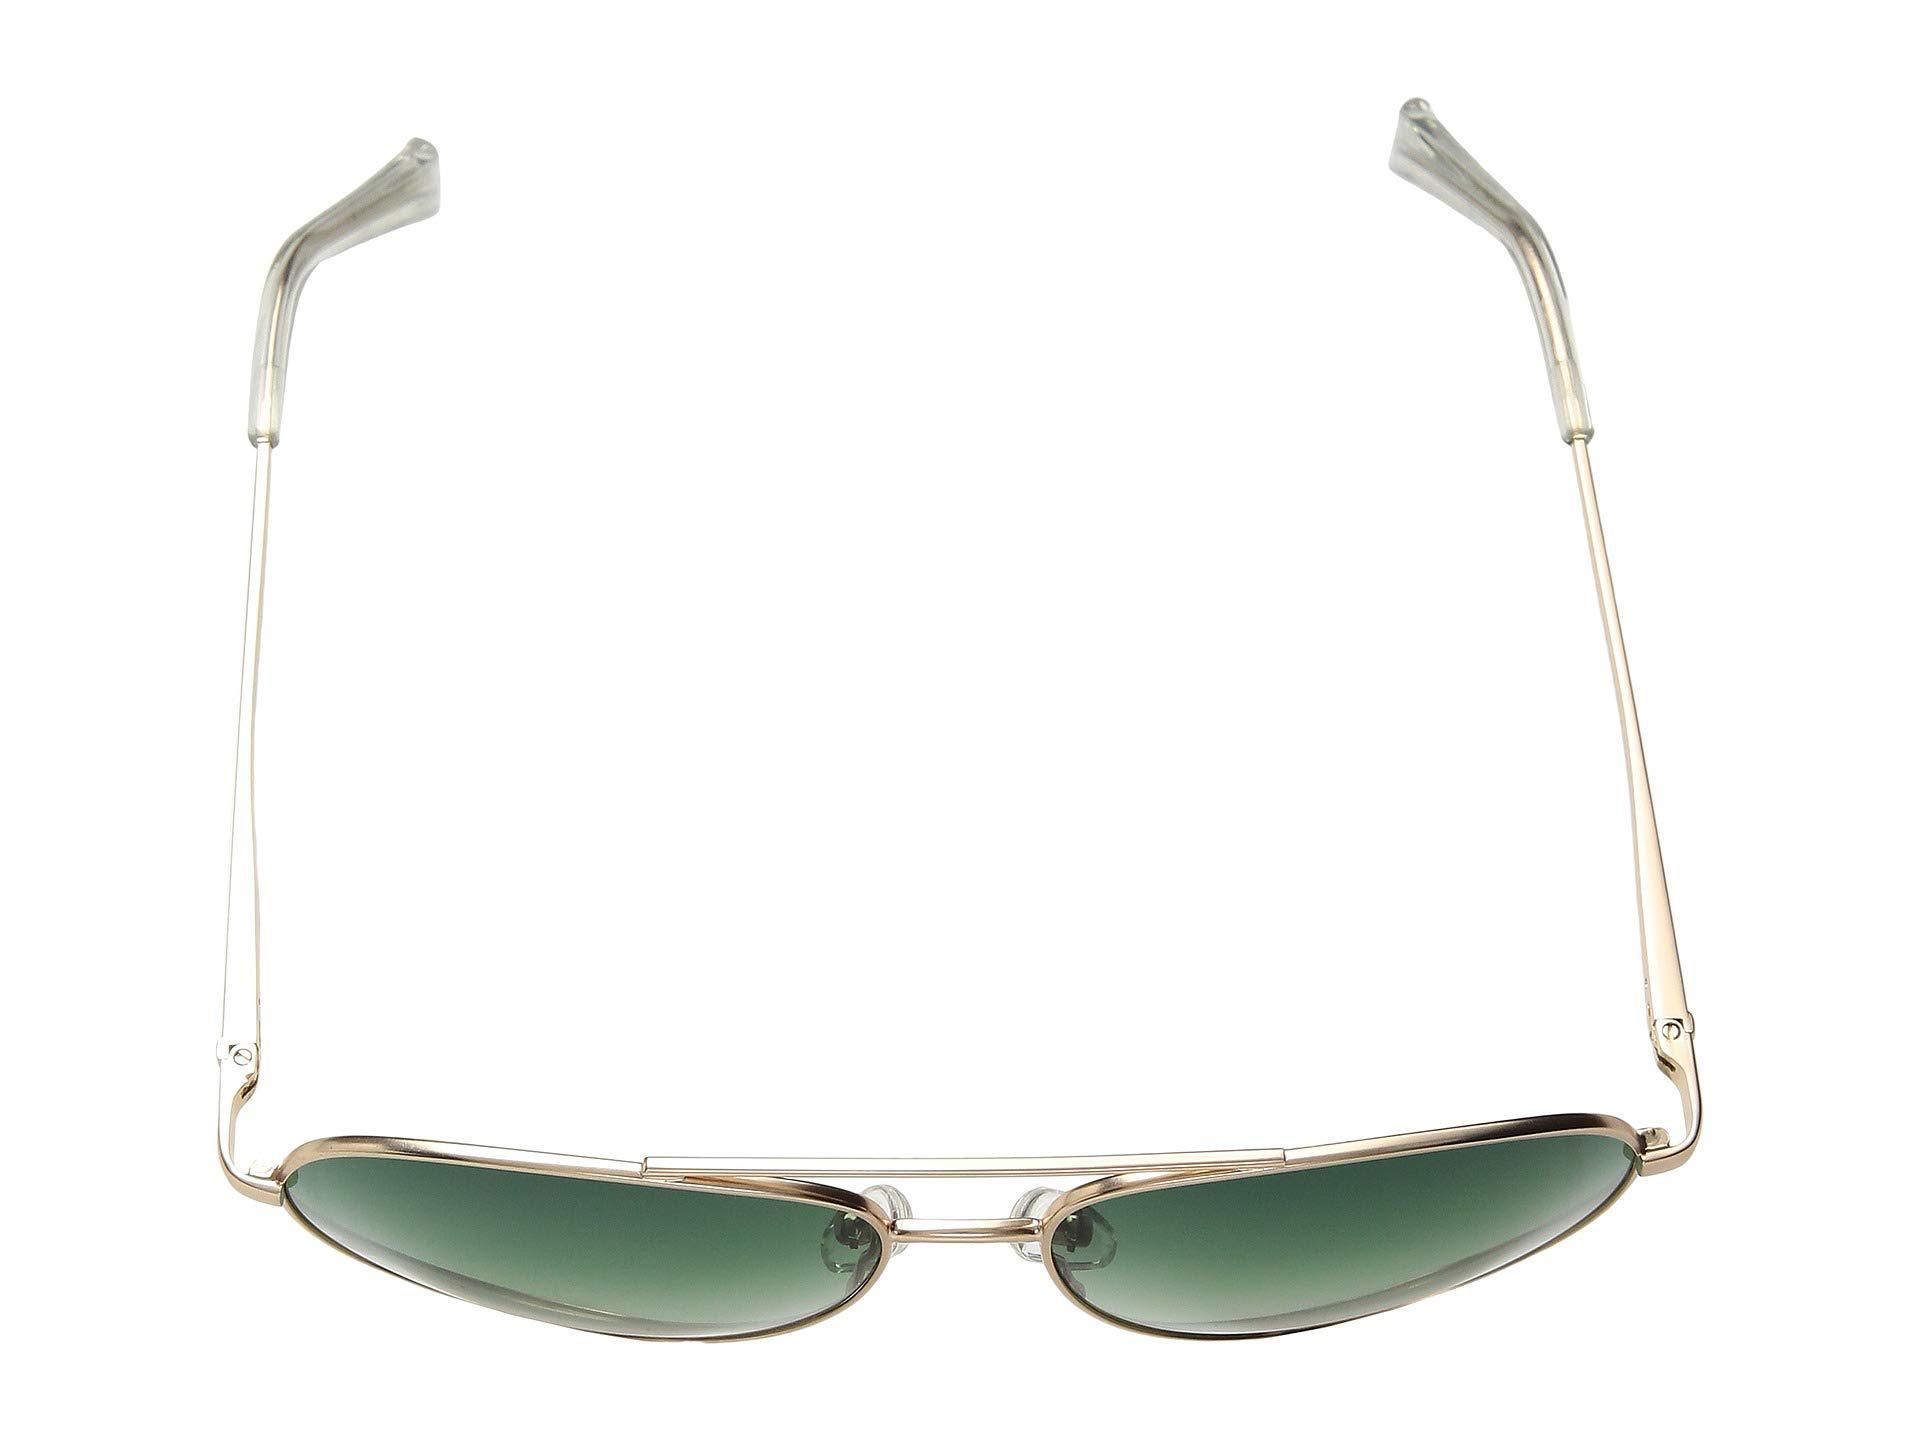 d12fa59e48 Steve Madden - Polarized Max (gold Frame green Lens) Fashion Sunglasses for  Men. View fullscreen